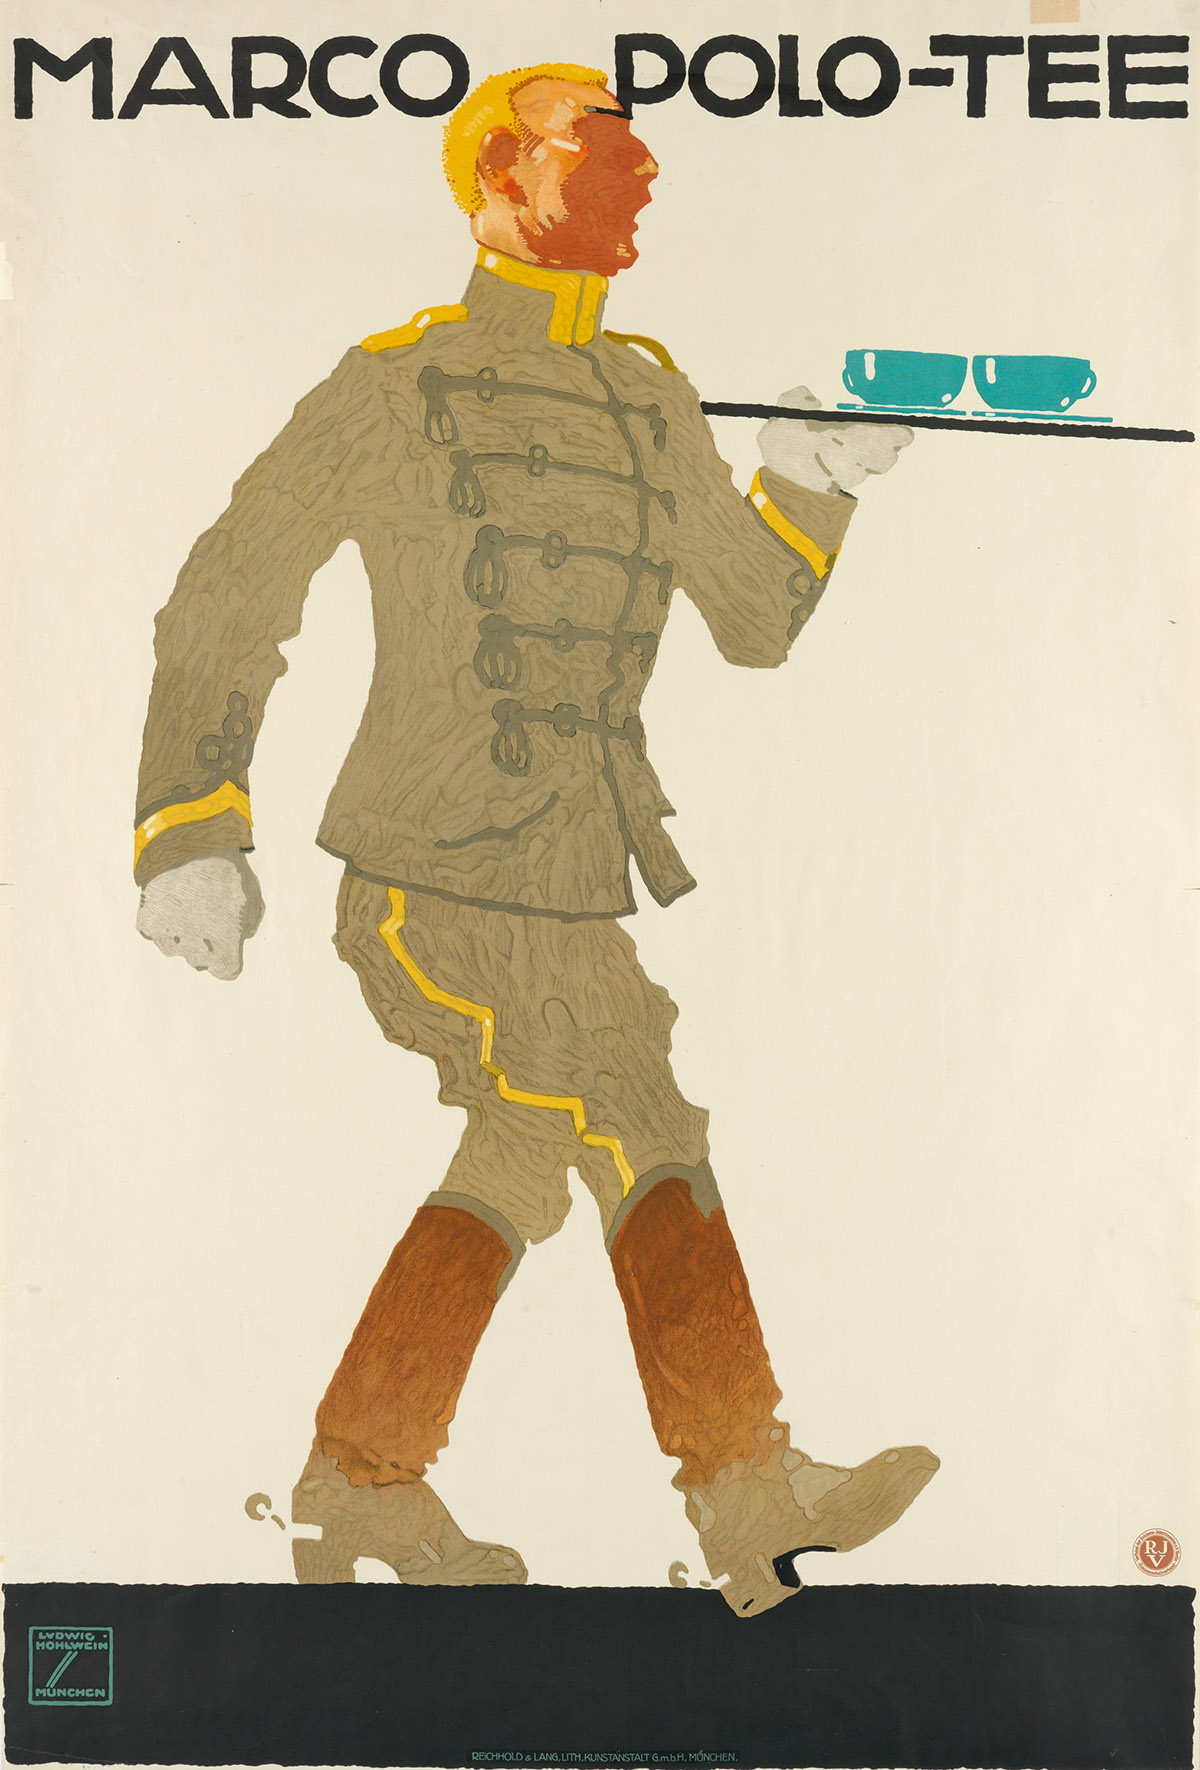 LUDWIG-HOHLWEIN-(1874-1949)-MARCO-POLO---TEE-Circa-1914-43x2